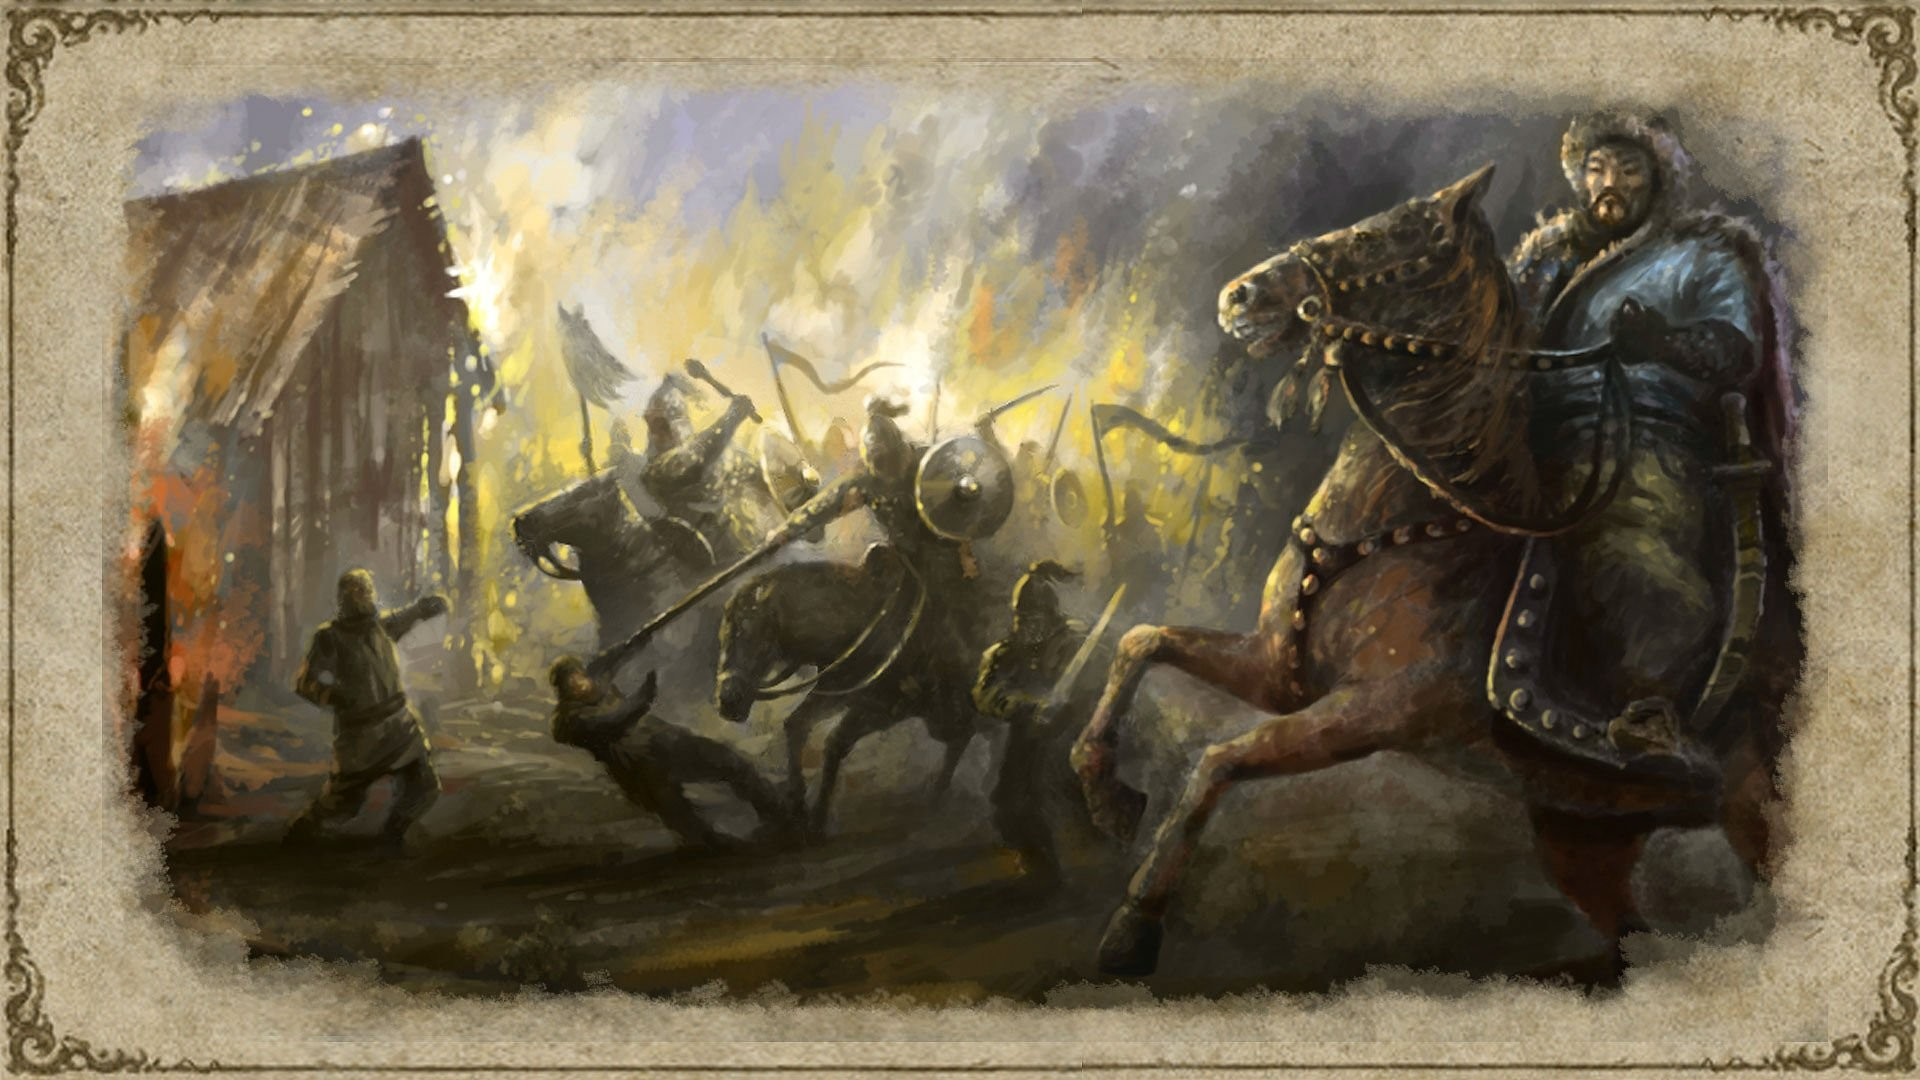 CRUSADER KINGS strategy medieval fantasy fighting rpg action history  1ckings warrior knight wallpaper | | 631638 | WallpaperUP